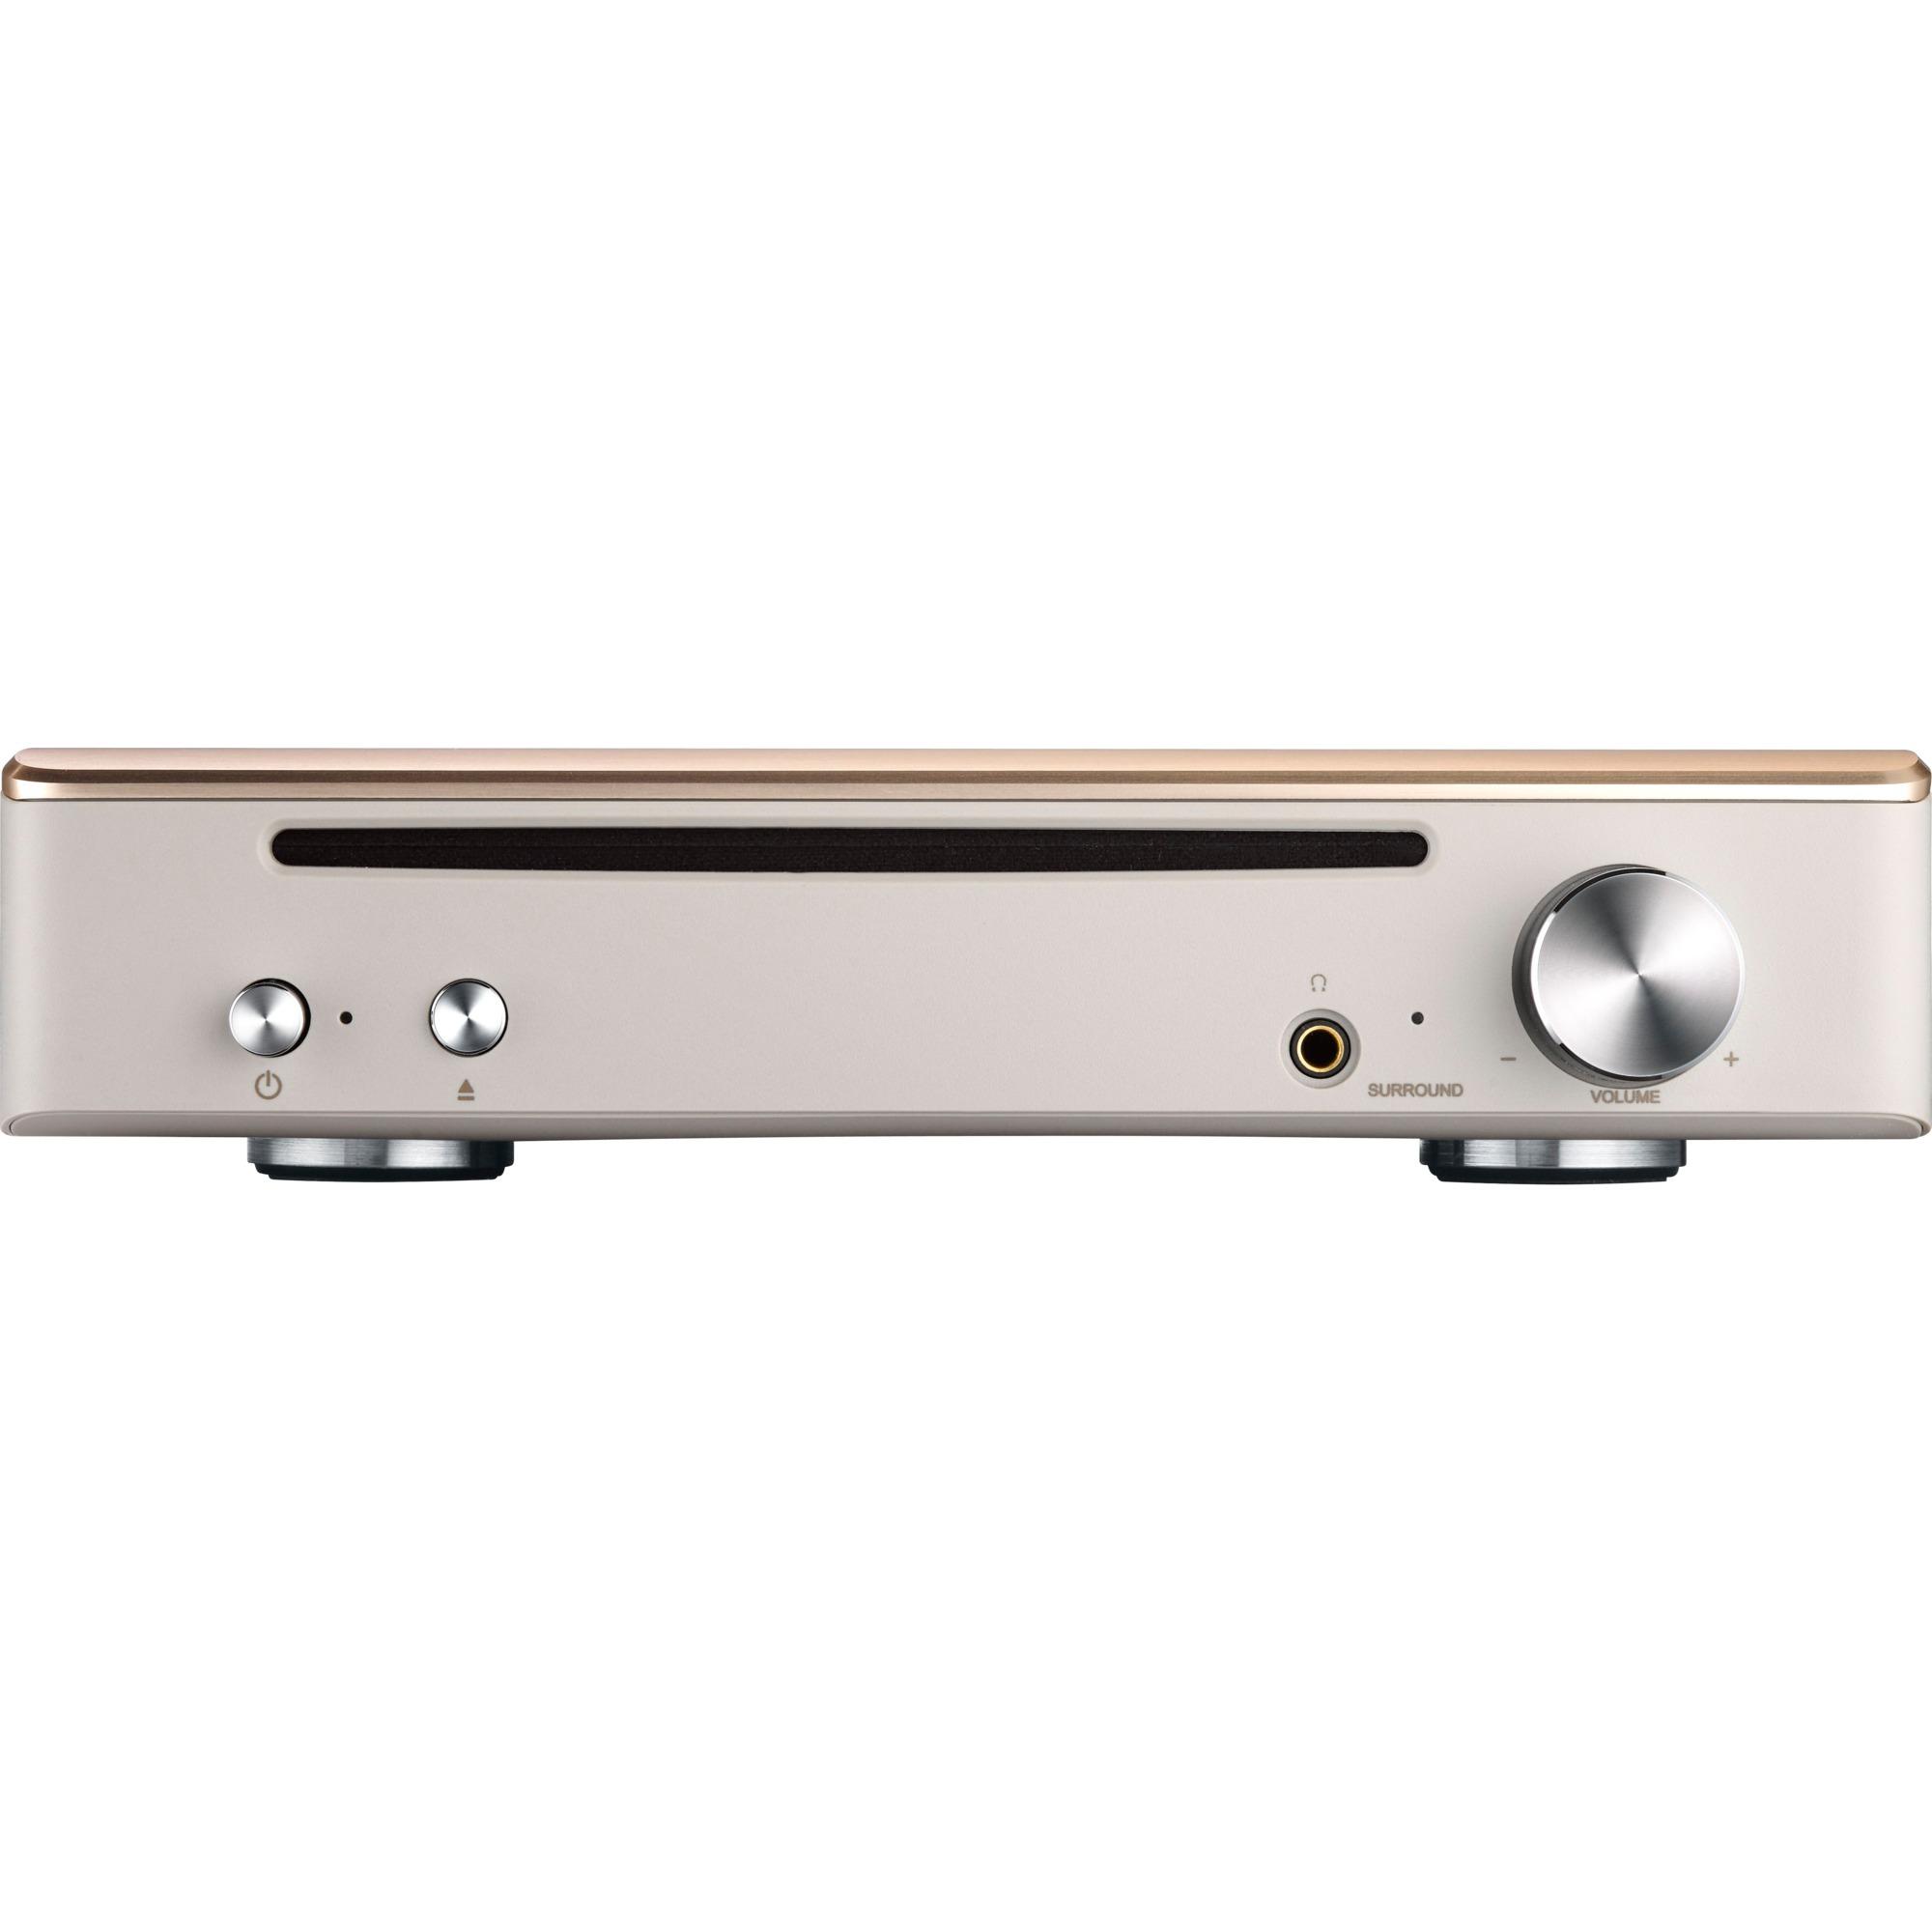 SBW-S1 Pro Enregistreur Blu-Ray 7.1canaux Compatibilité 3D Or, Graveur Blu-ray